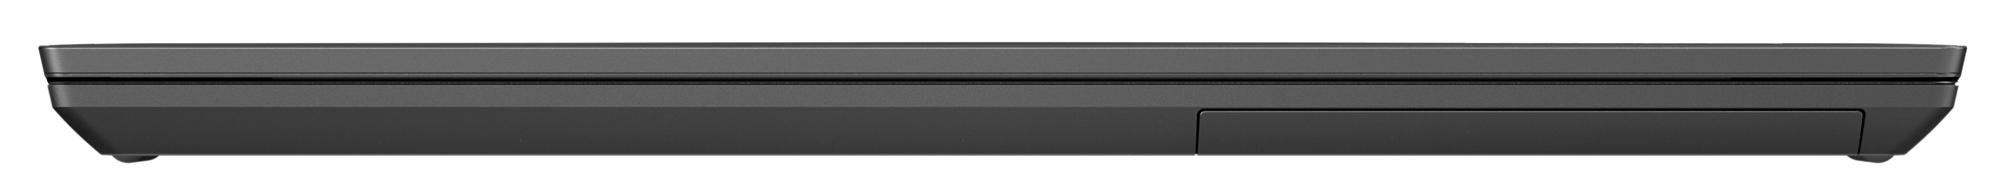 Фото  Ноутбук Lenovo V330-14 Grey (81B1000MRA)